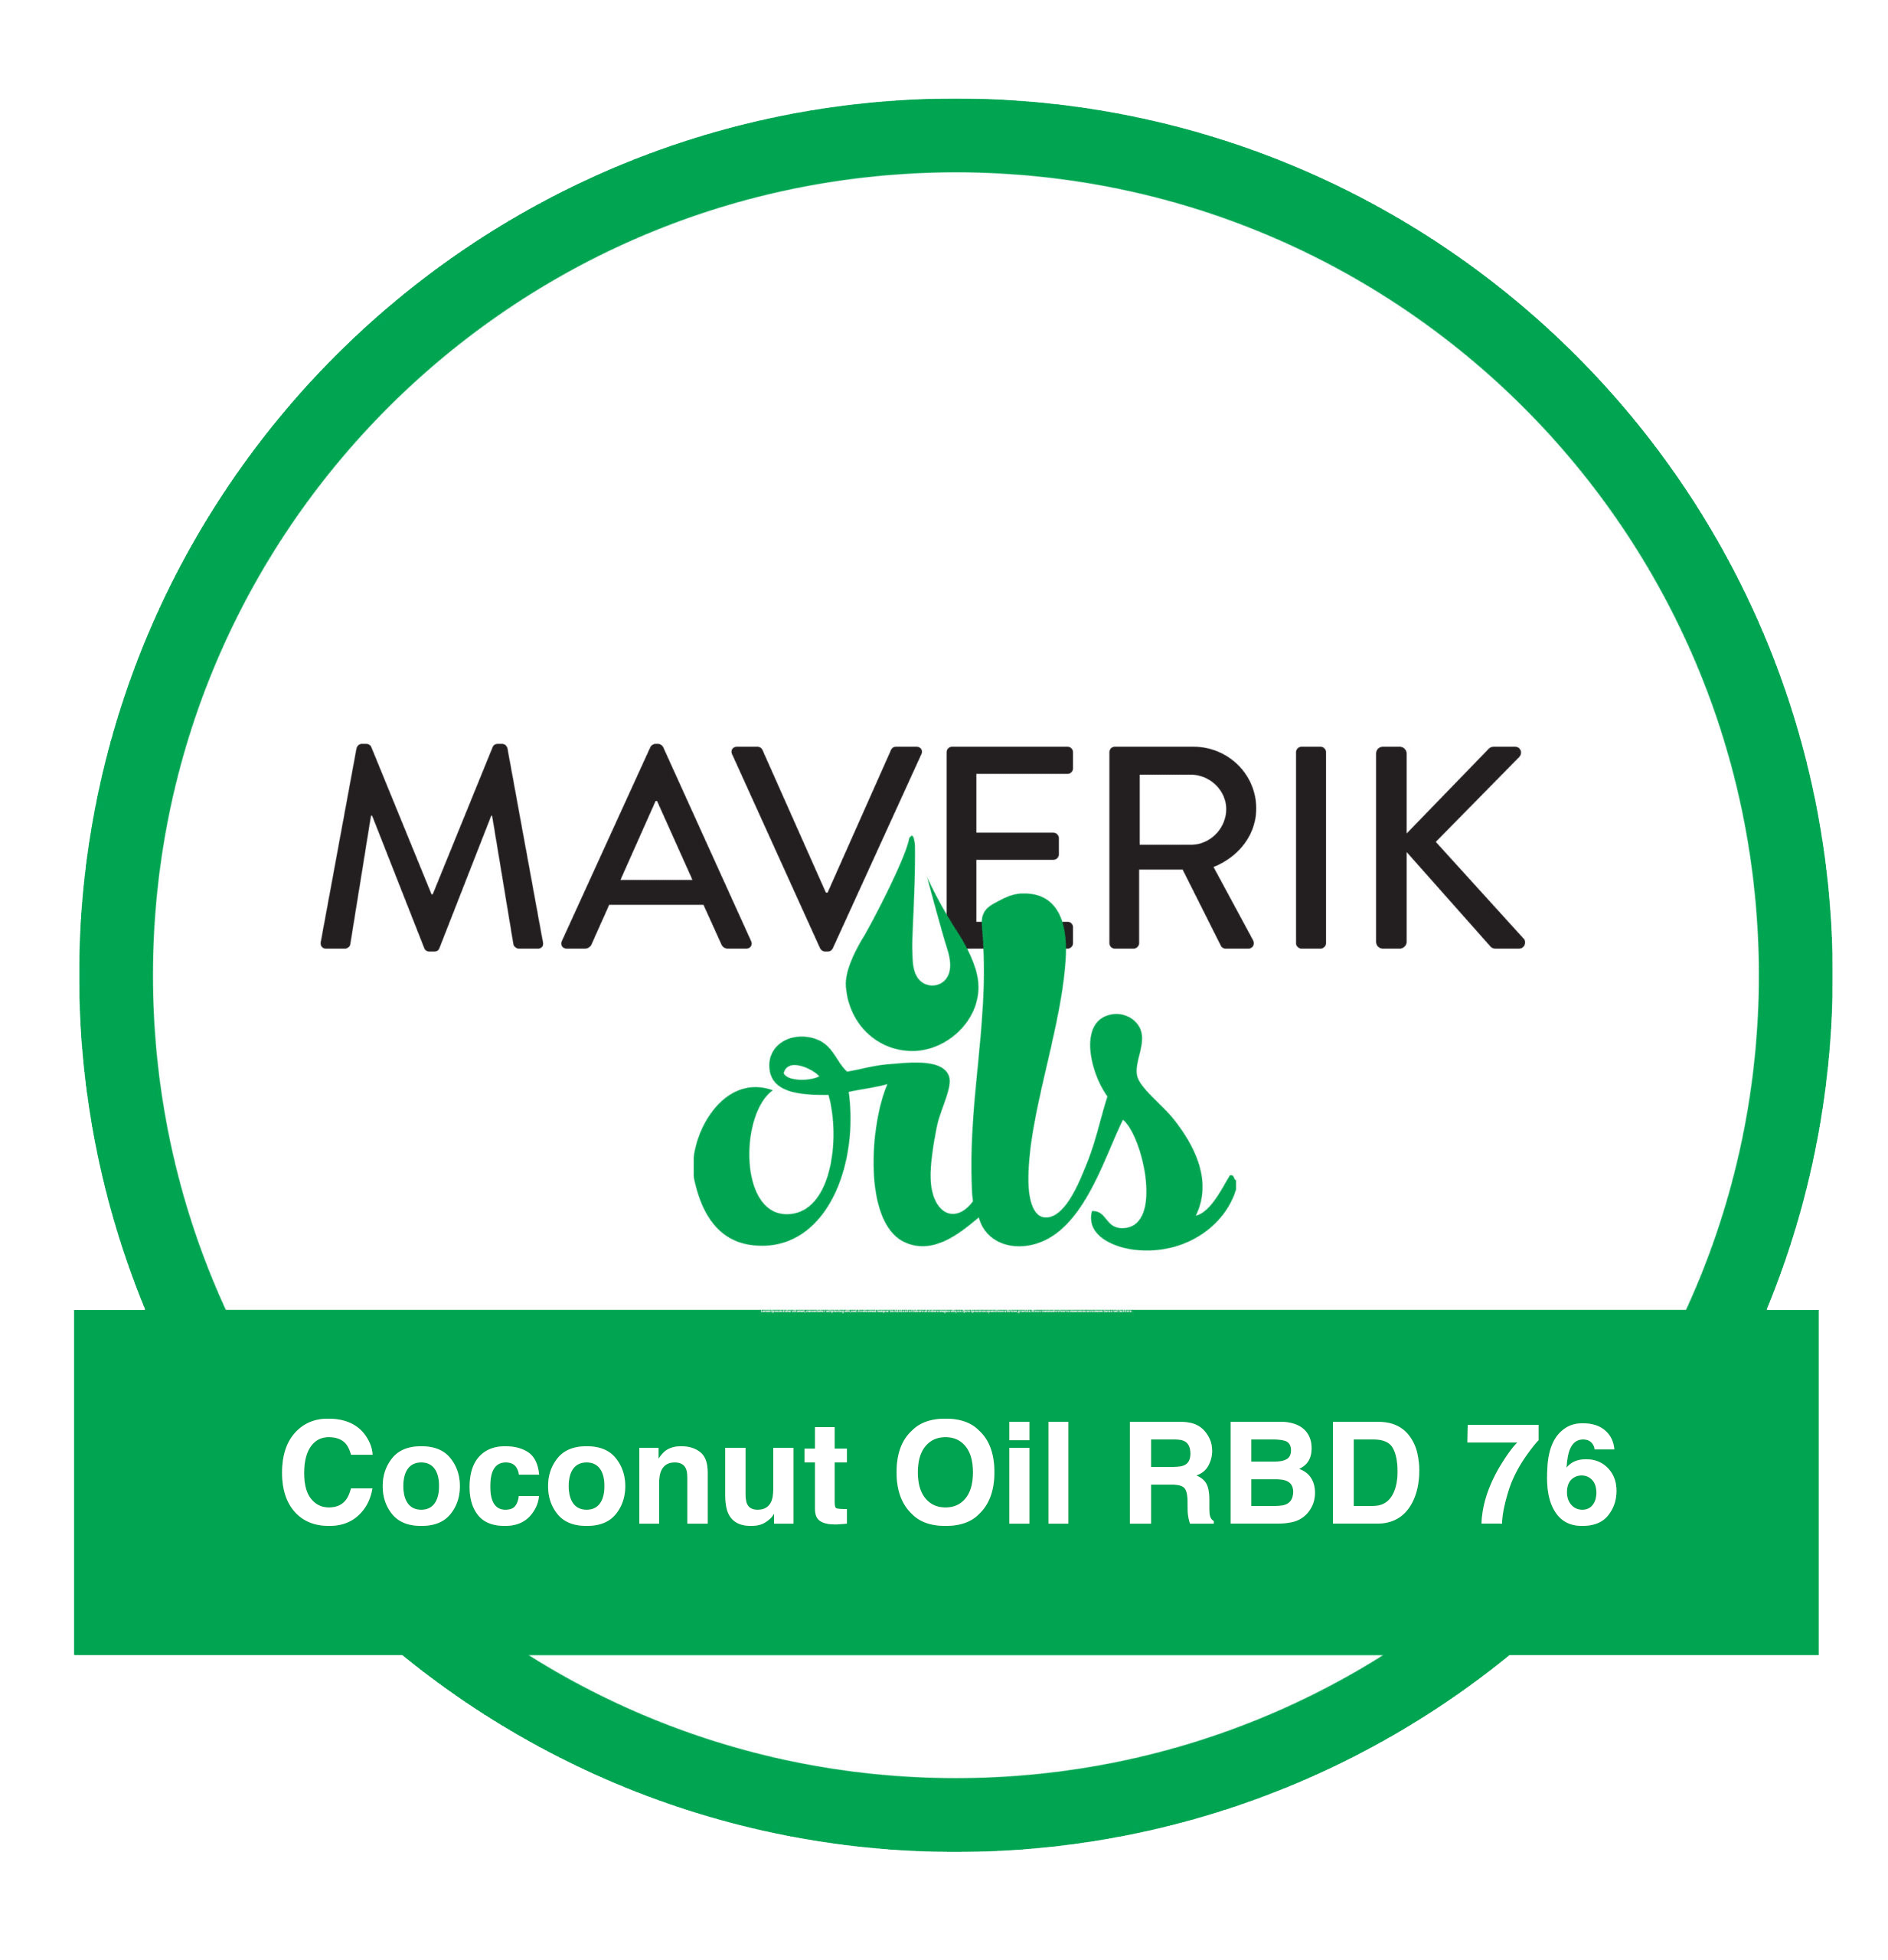 Coconut Oil RBD 76